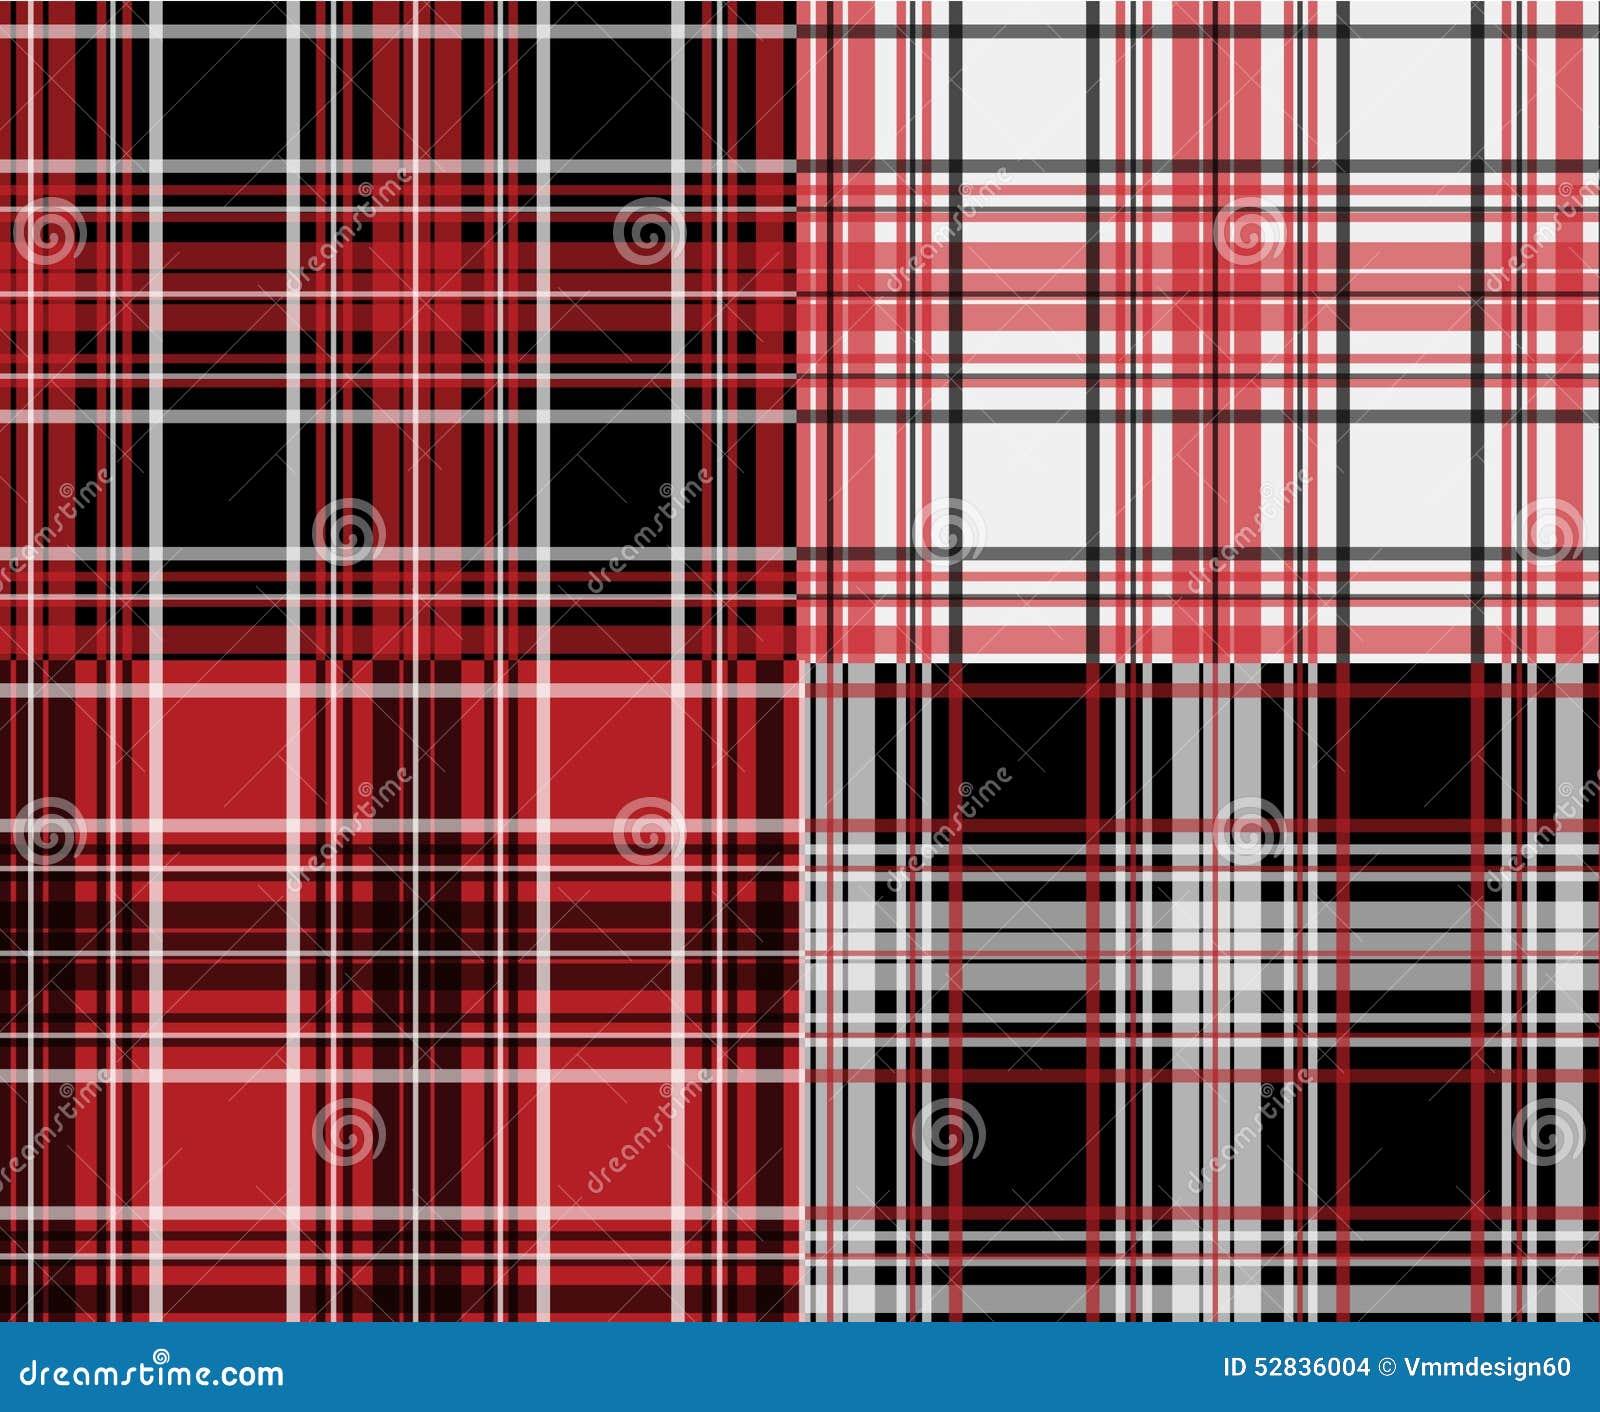 Lumberjack Plaid Textile Graphic Seamless Woven Design